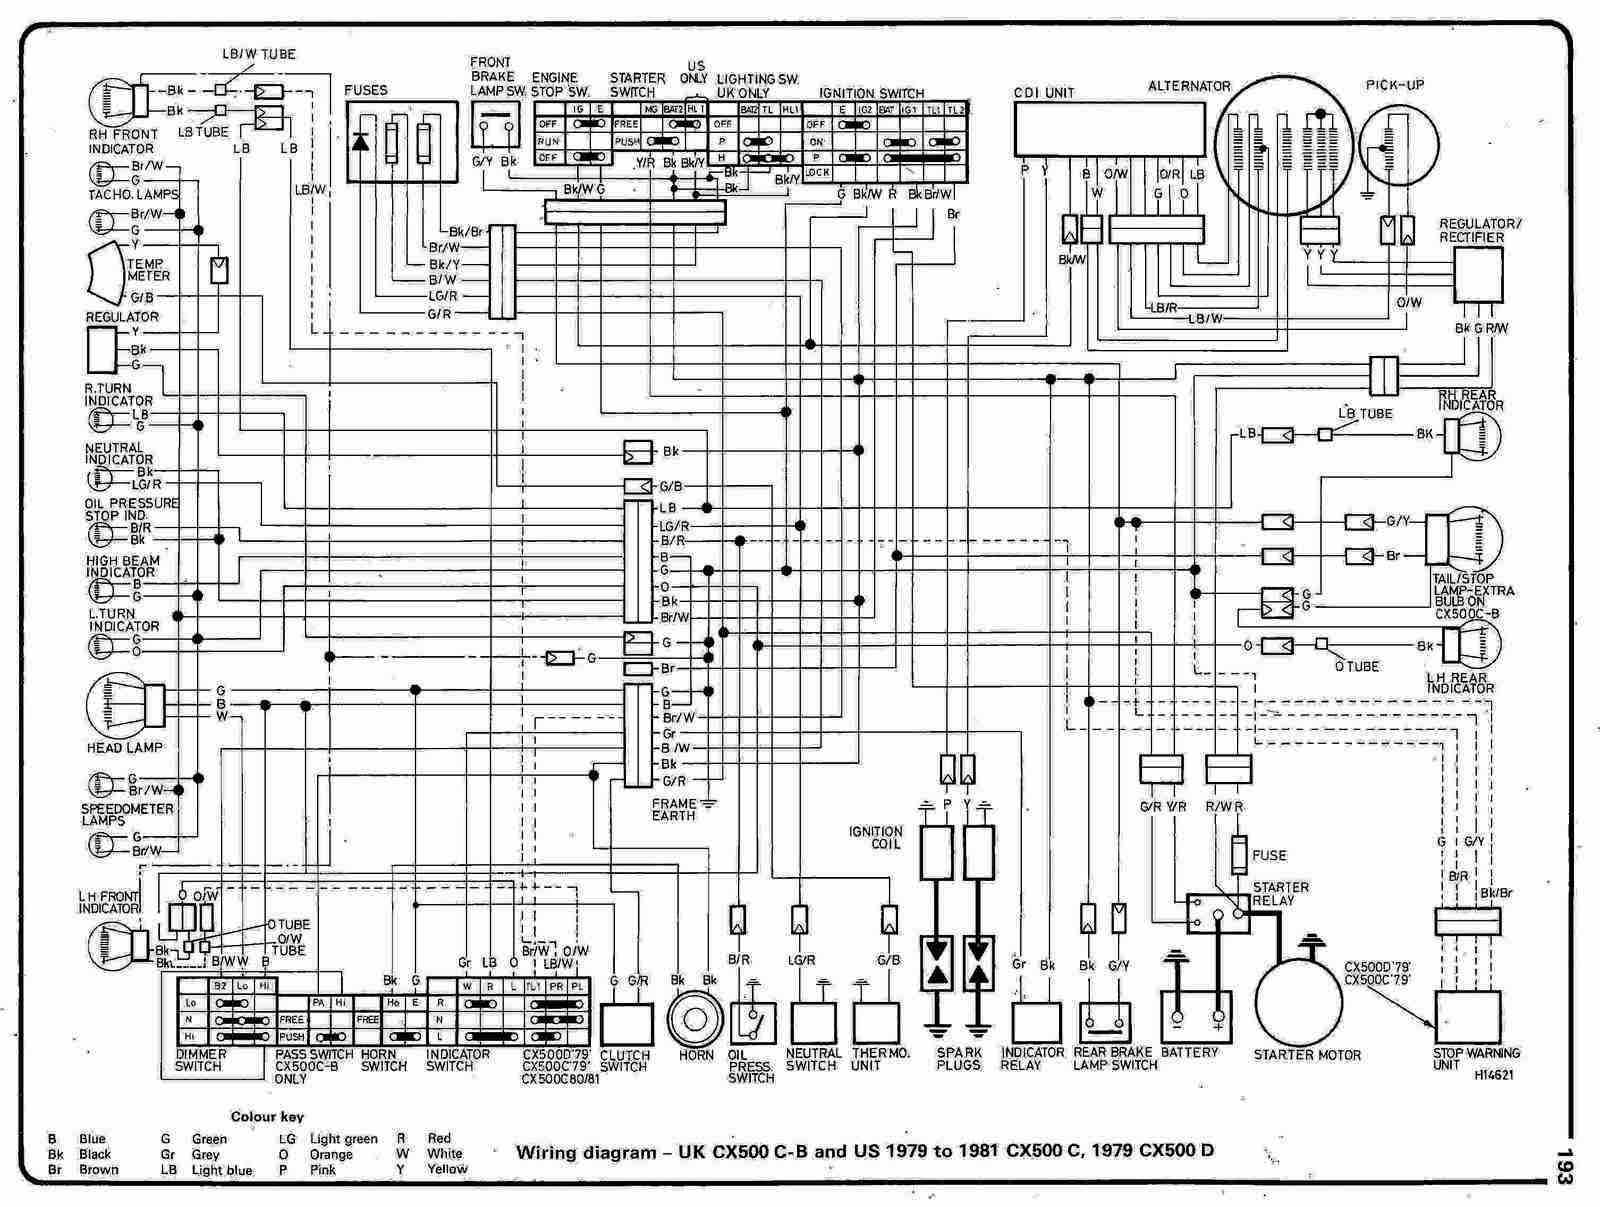 1998 honda fourtrax 300 service manual pdf